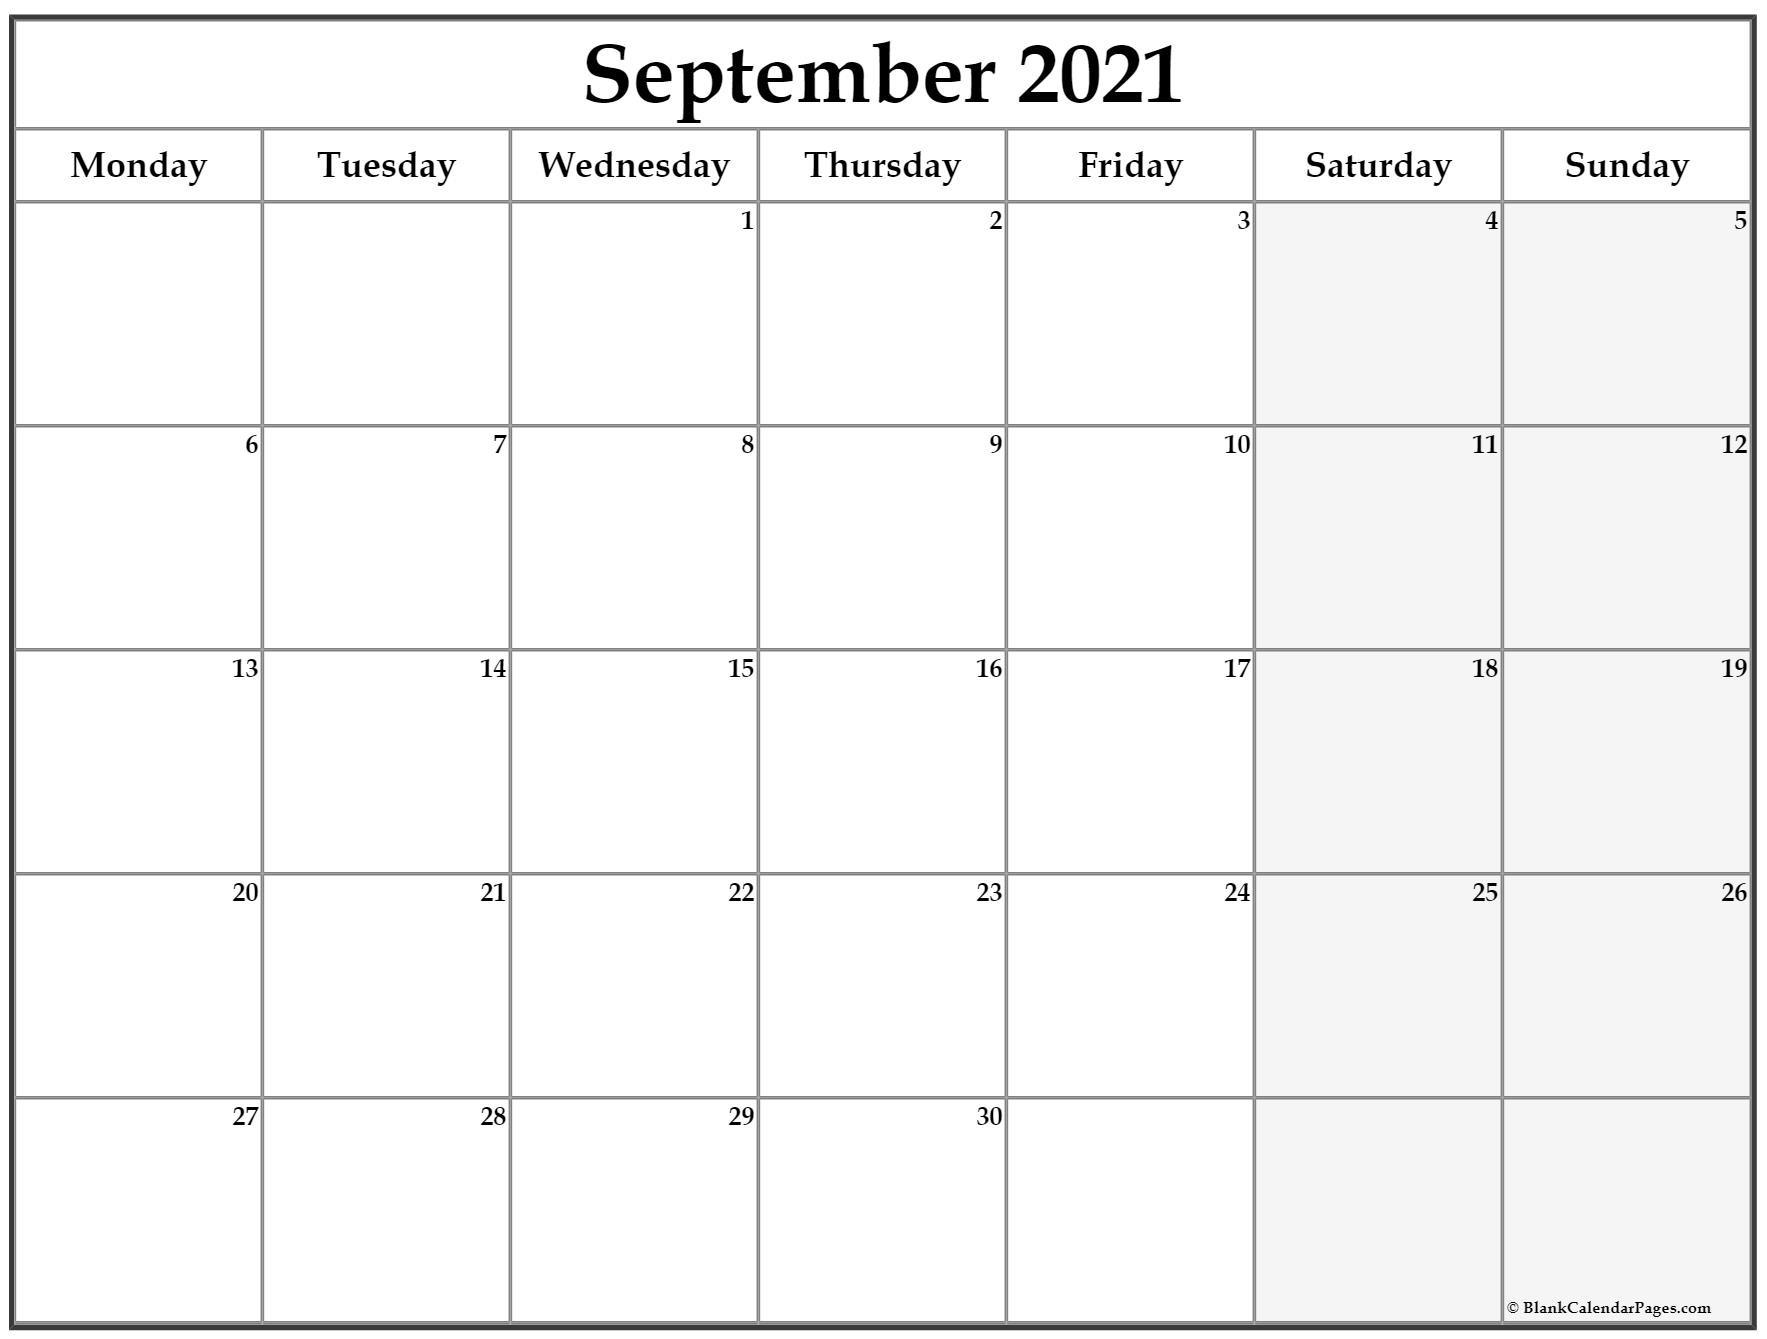 September 2021 Monday Calendar | Monday To Sunday-August 2021 Calendar Monday Through Friday Only